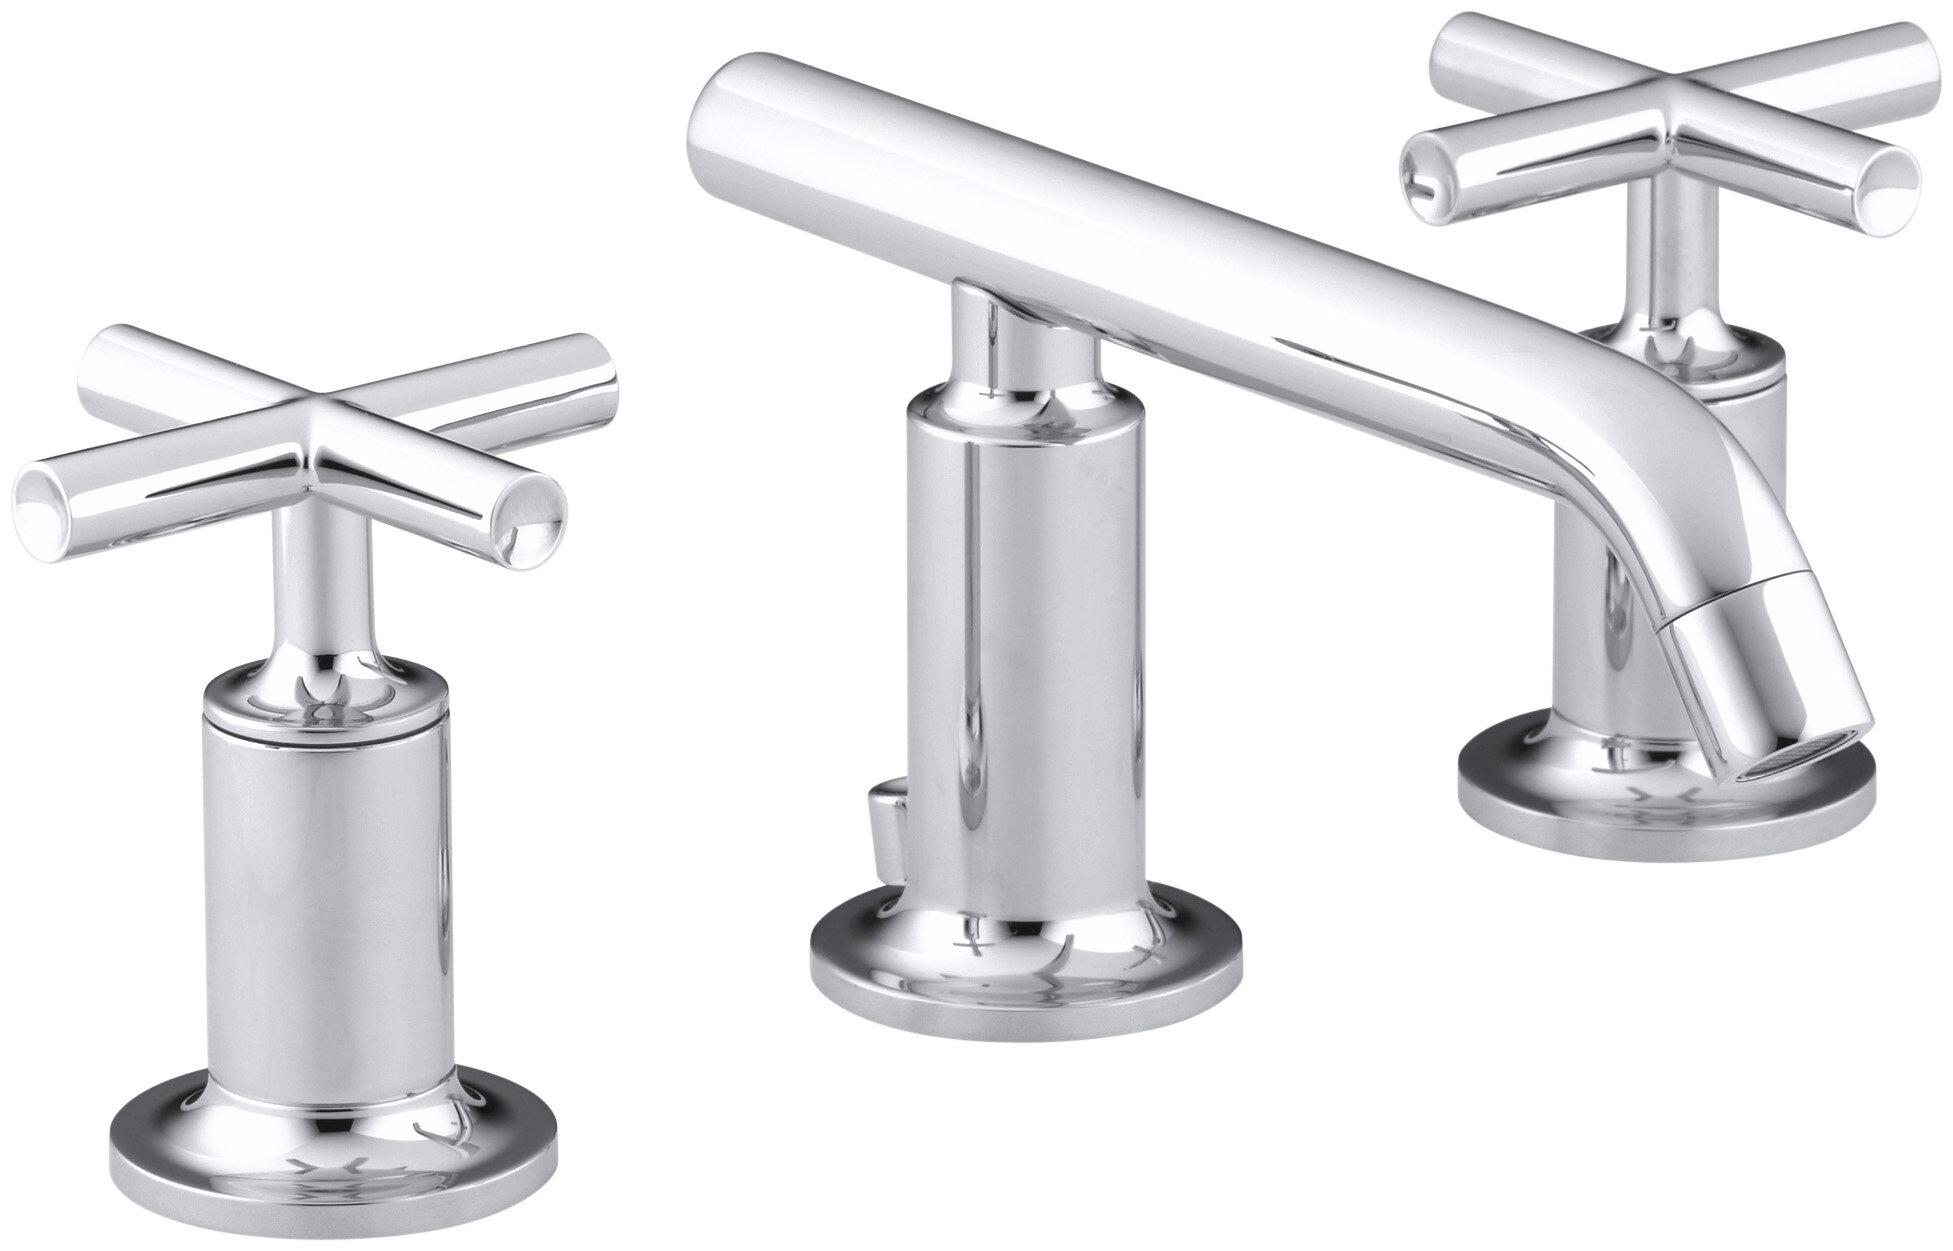 K-14410-3-BGD,BL,BN Kohler Purist Widespread Bathroom Sink Faucet ...